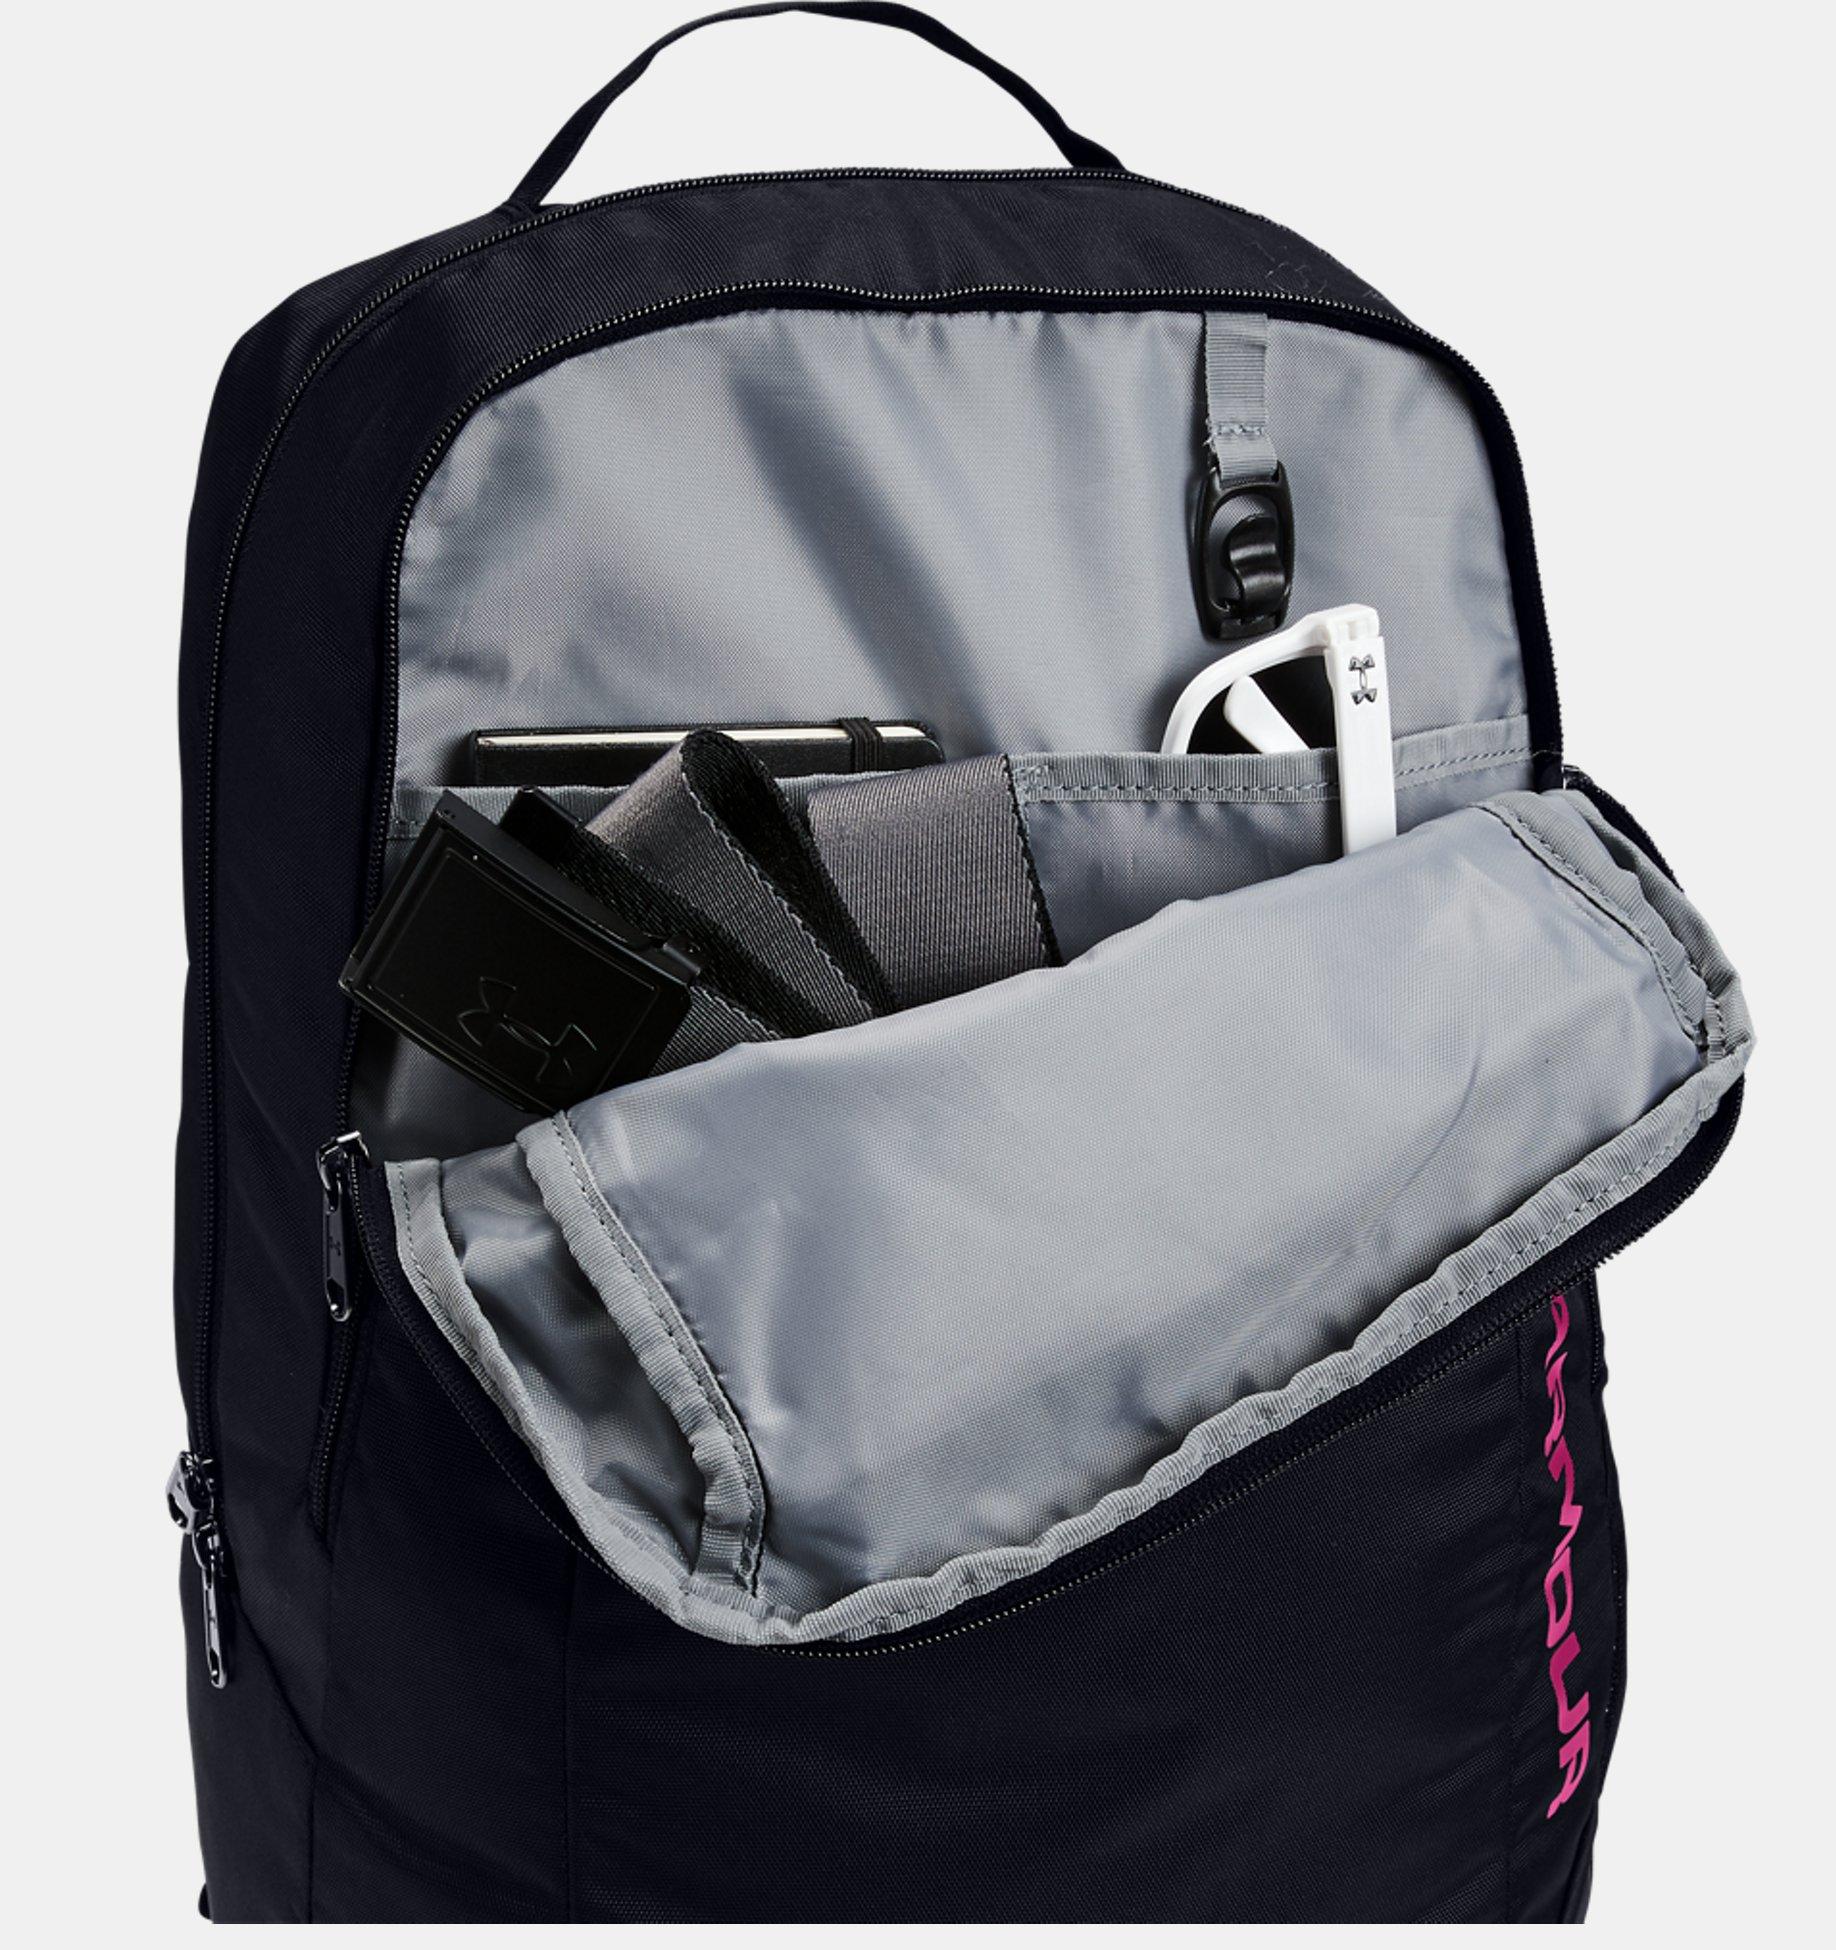 014e420d344 UA Hustle LDWR Backpack | Under Armour DK